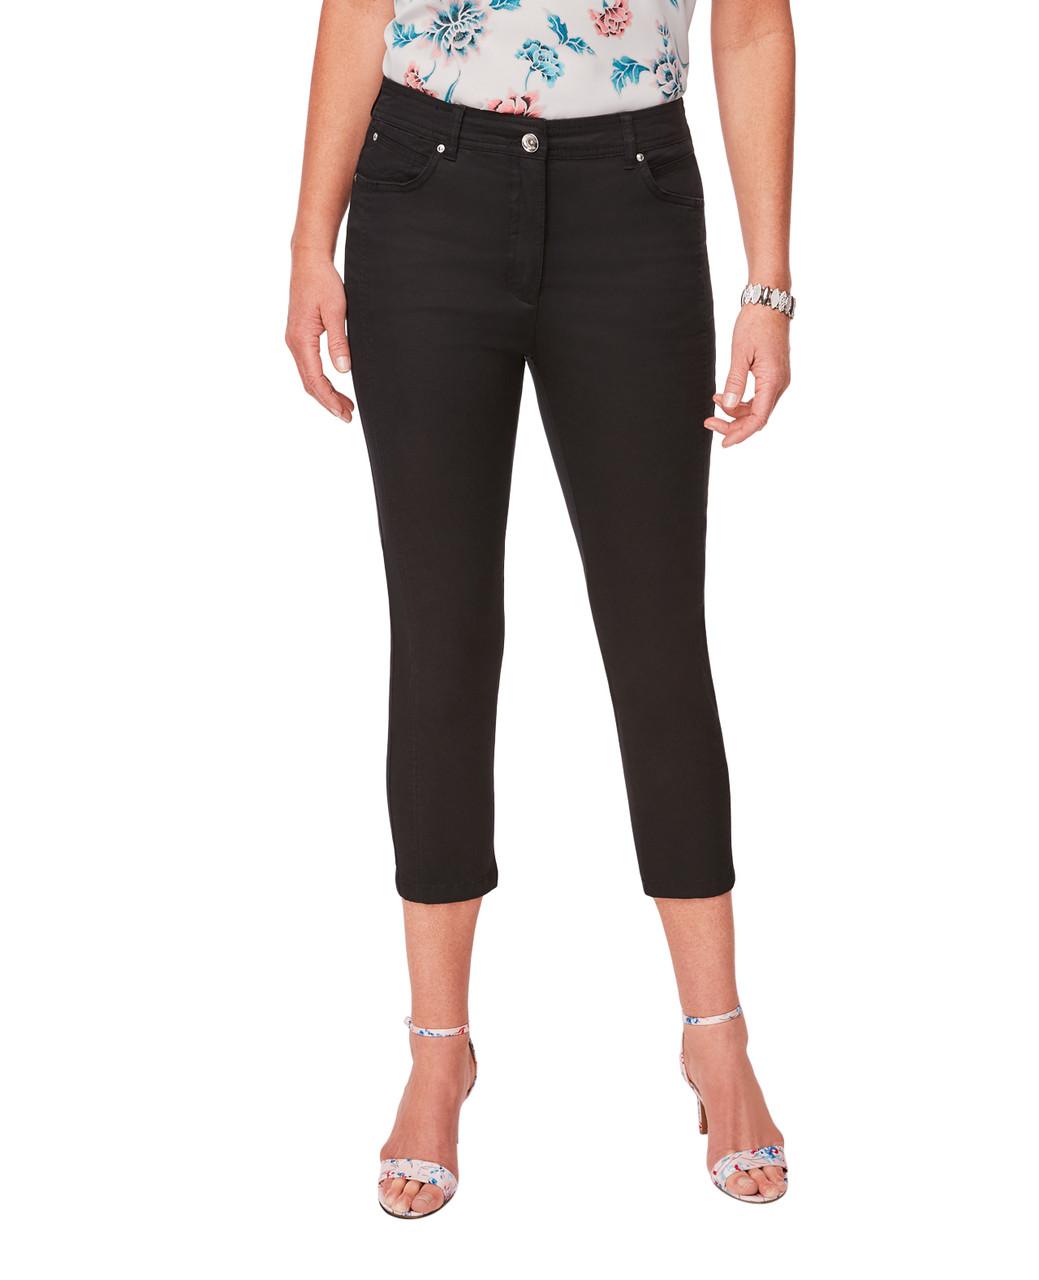 c704de2142 Black Slim Capri Pant for Women | Northern Reflections